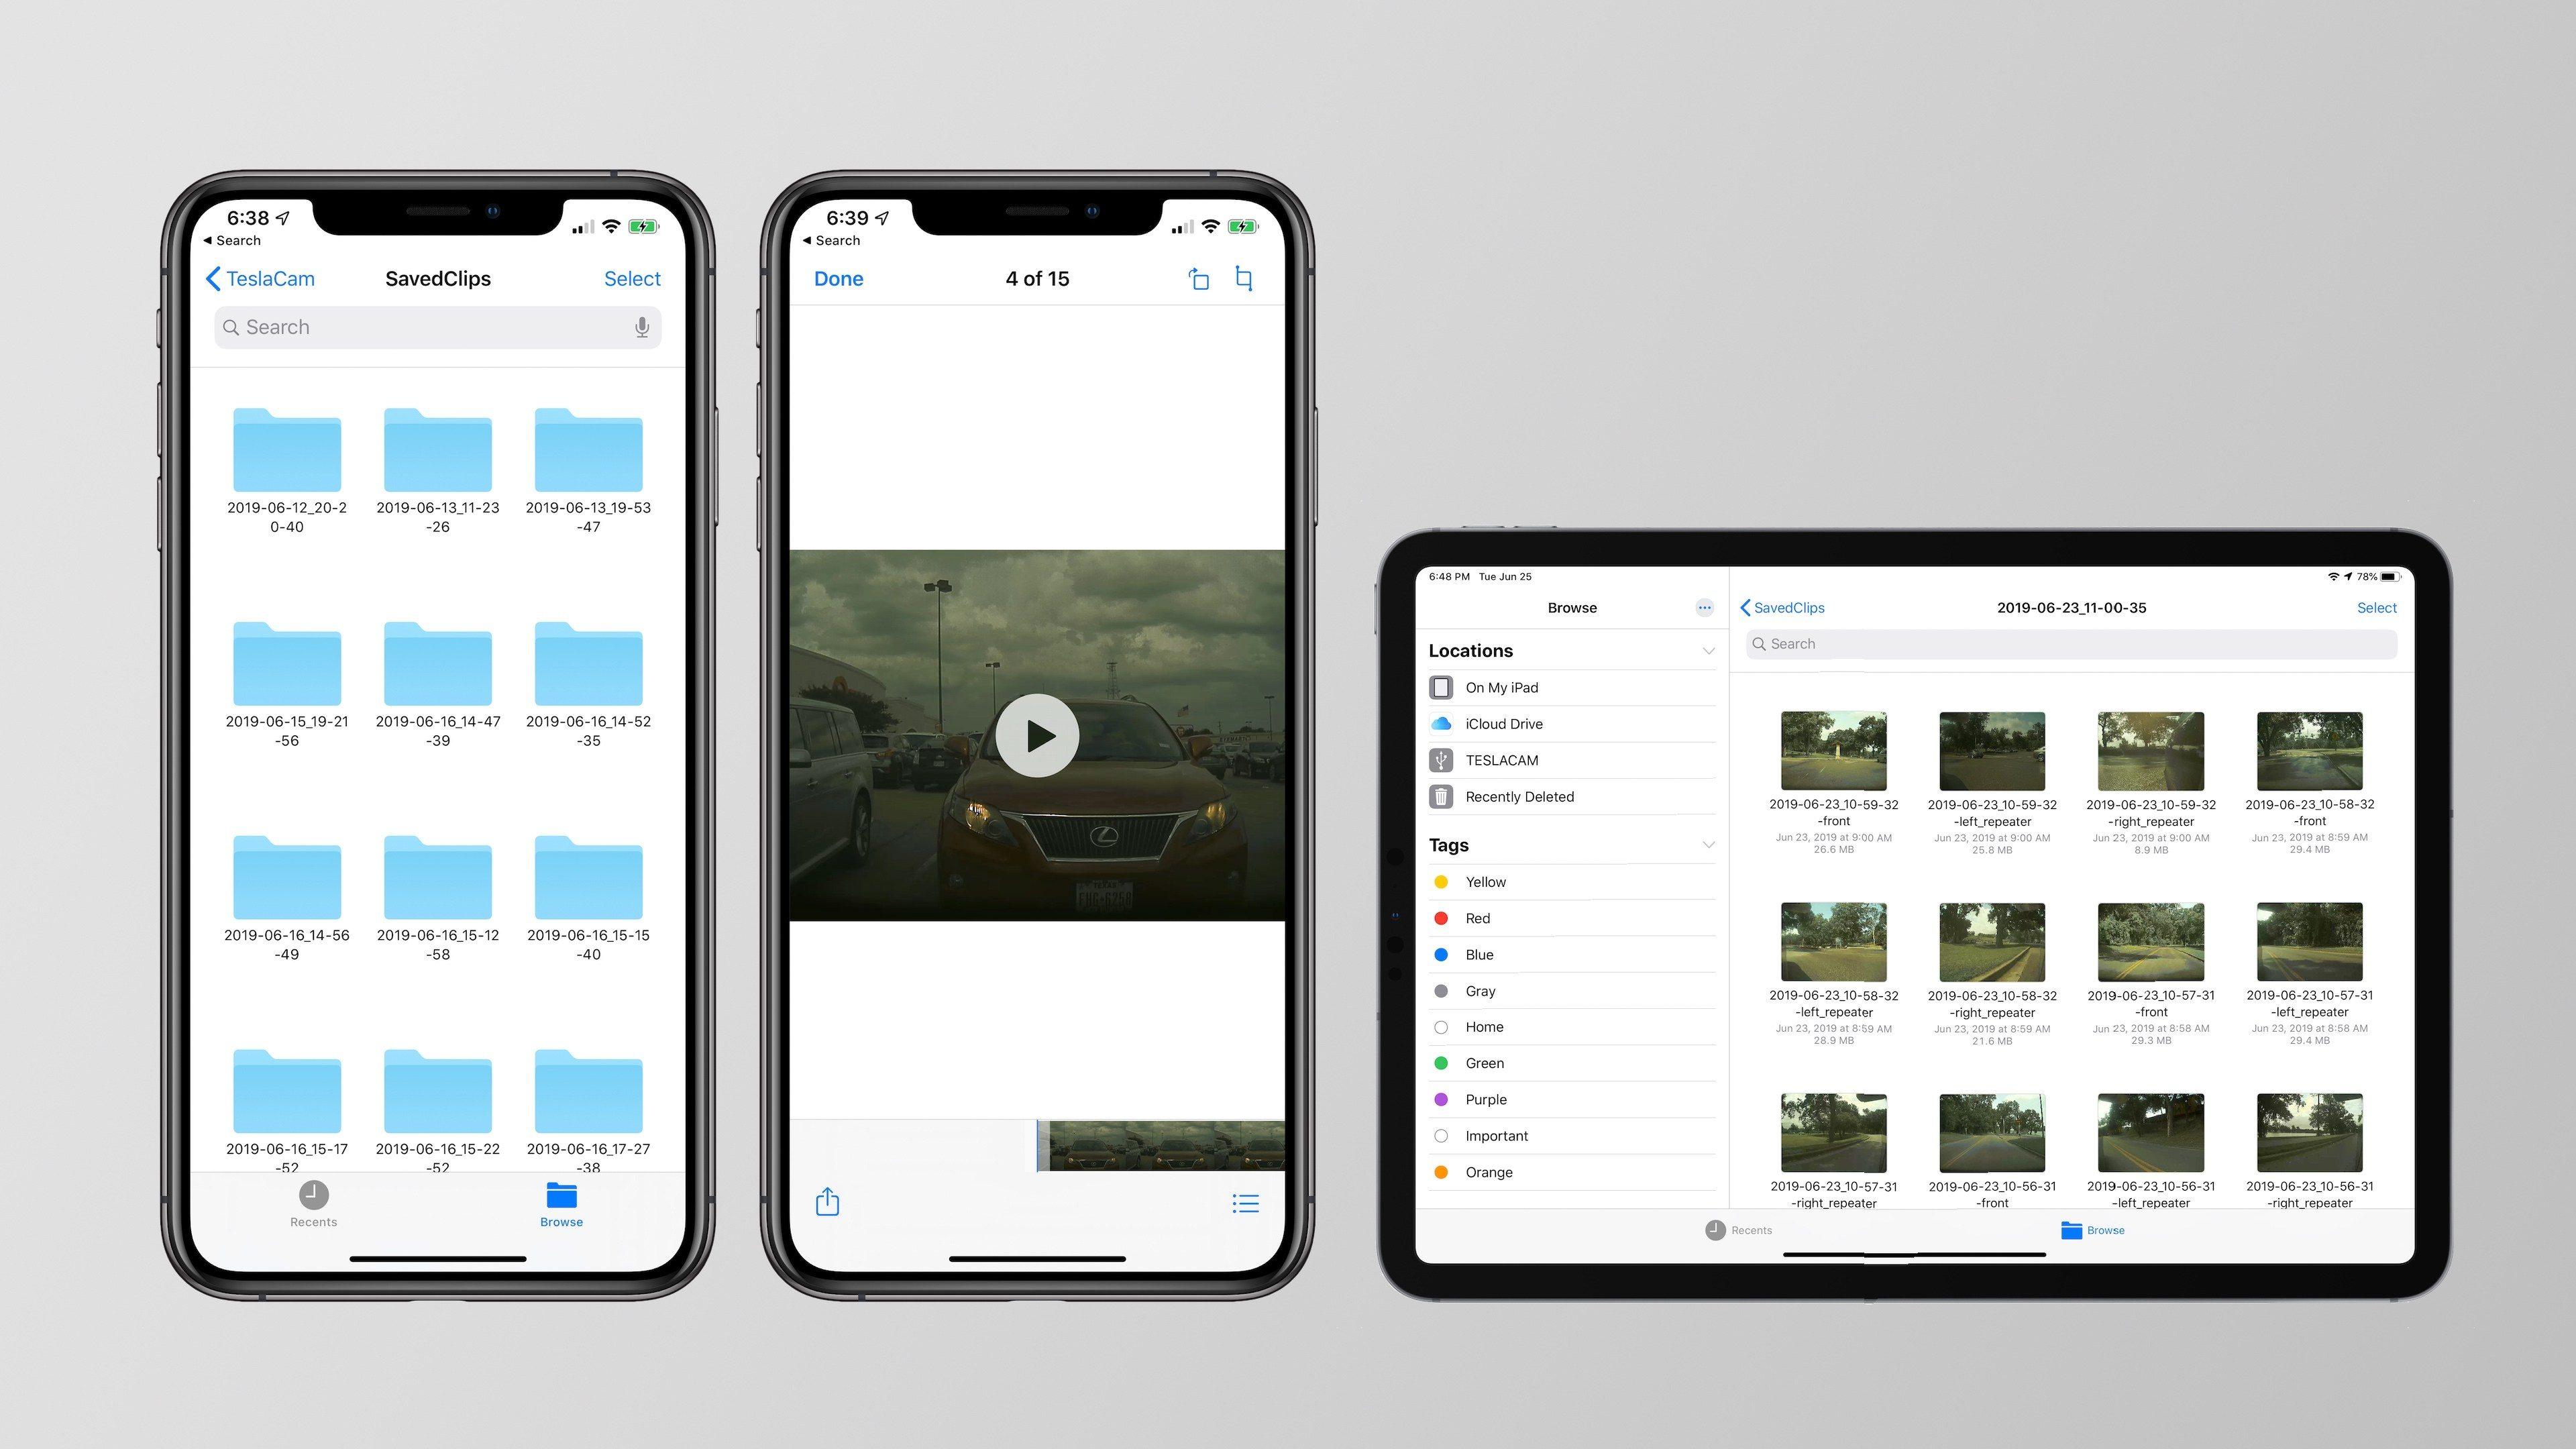 teslaCam-iPhone-ipad-sentry-video-ios-ipados